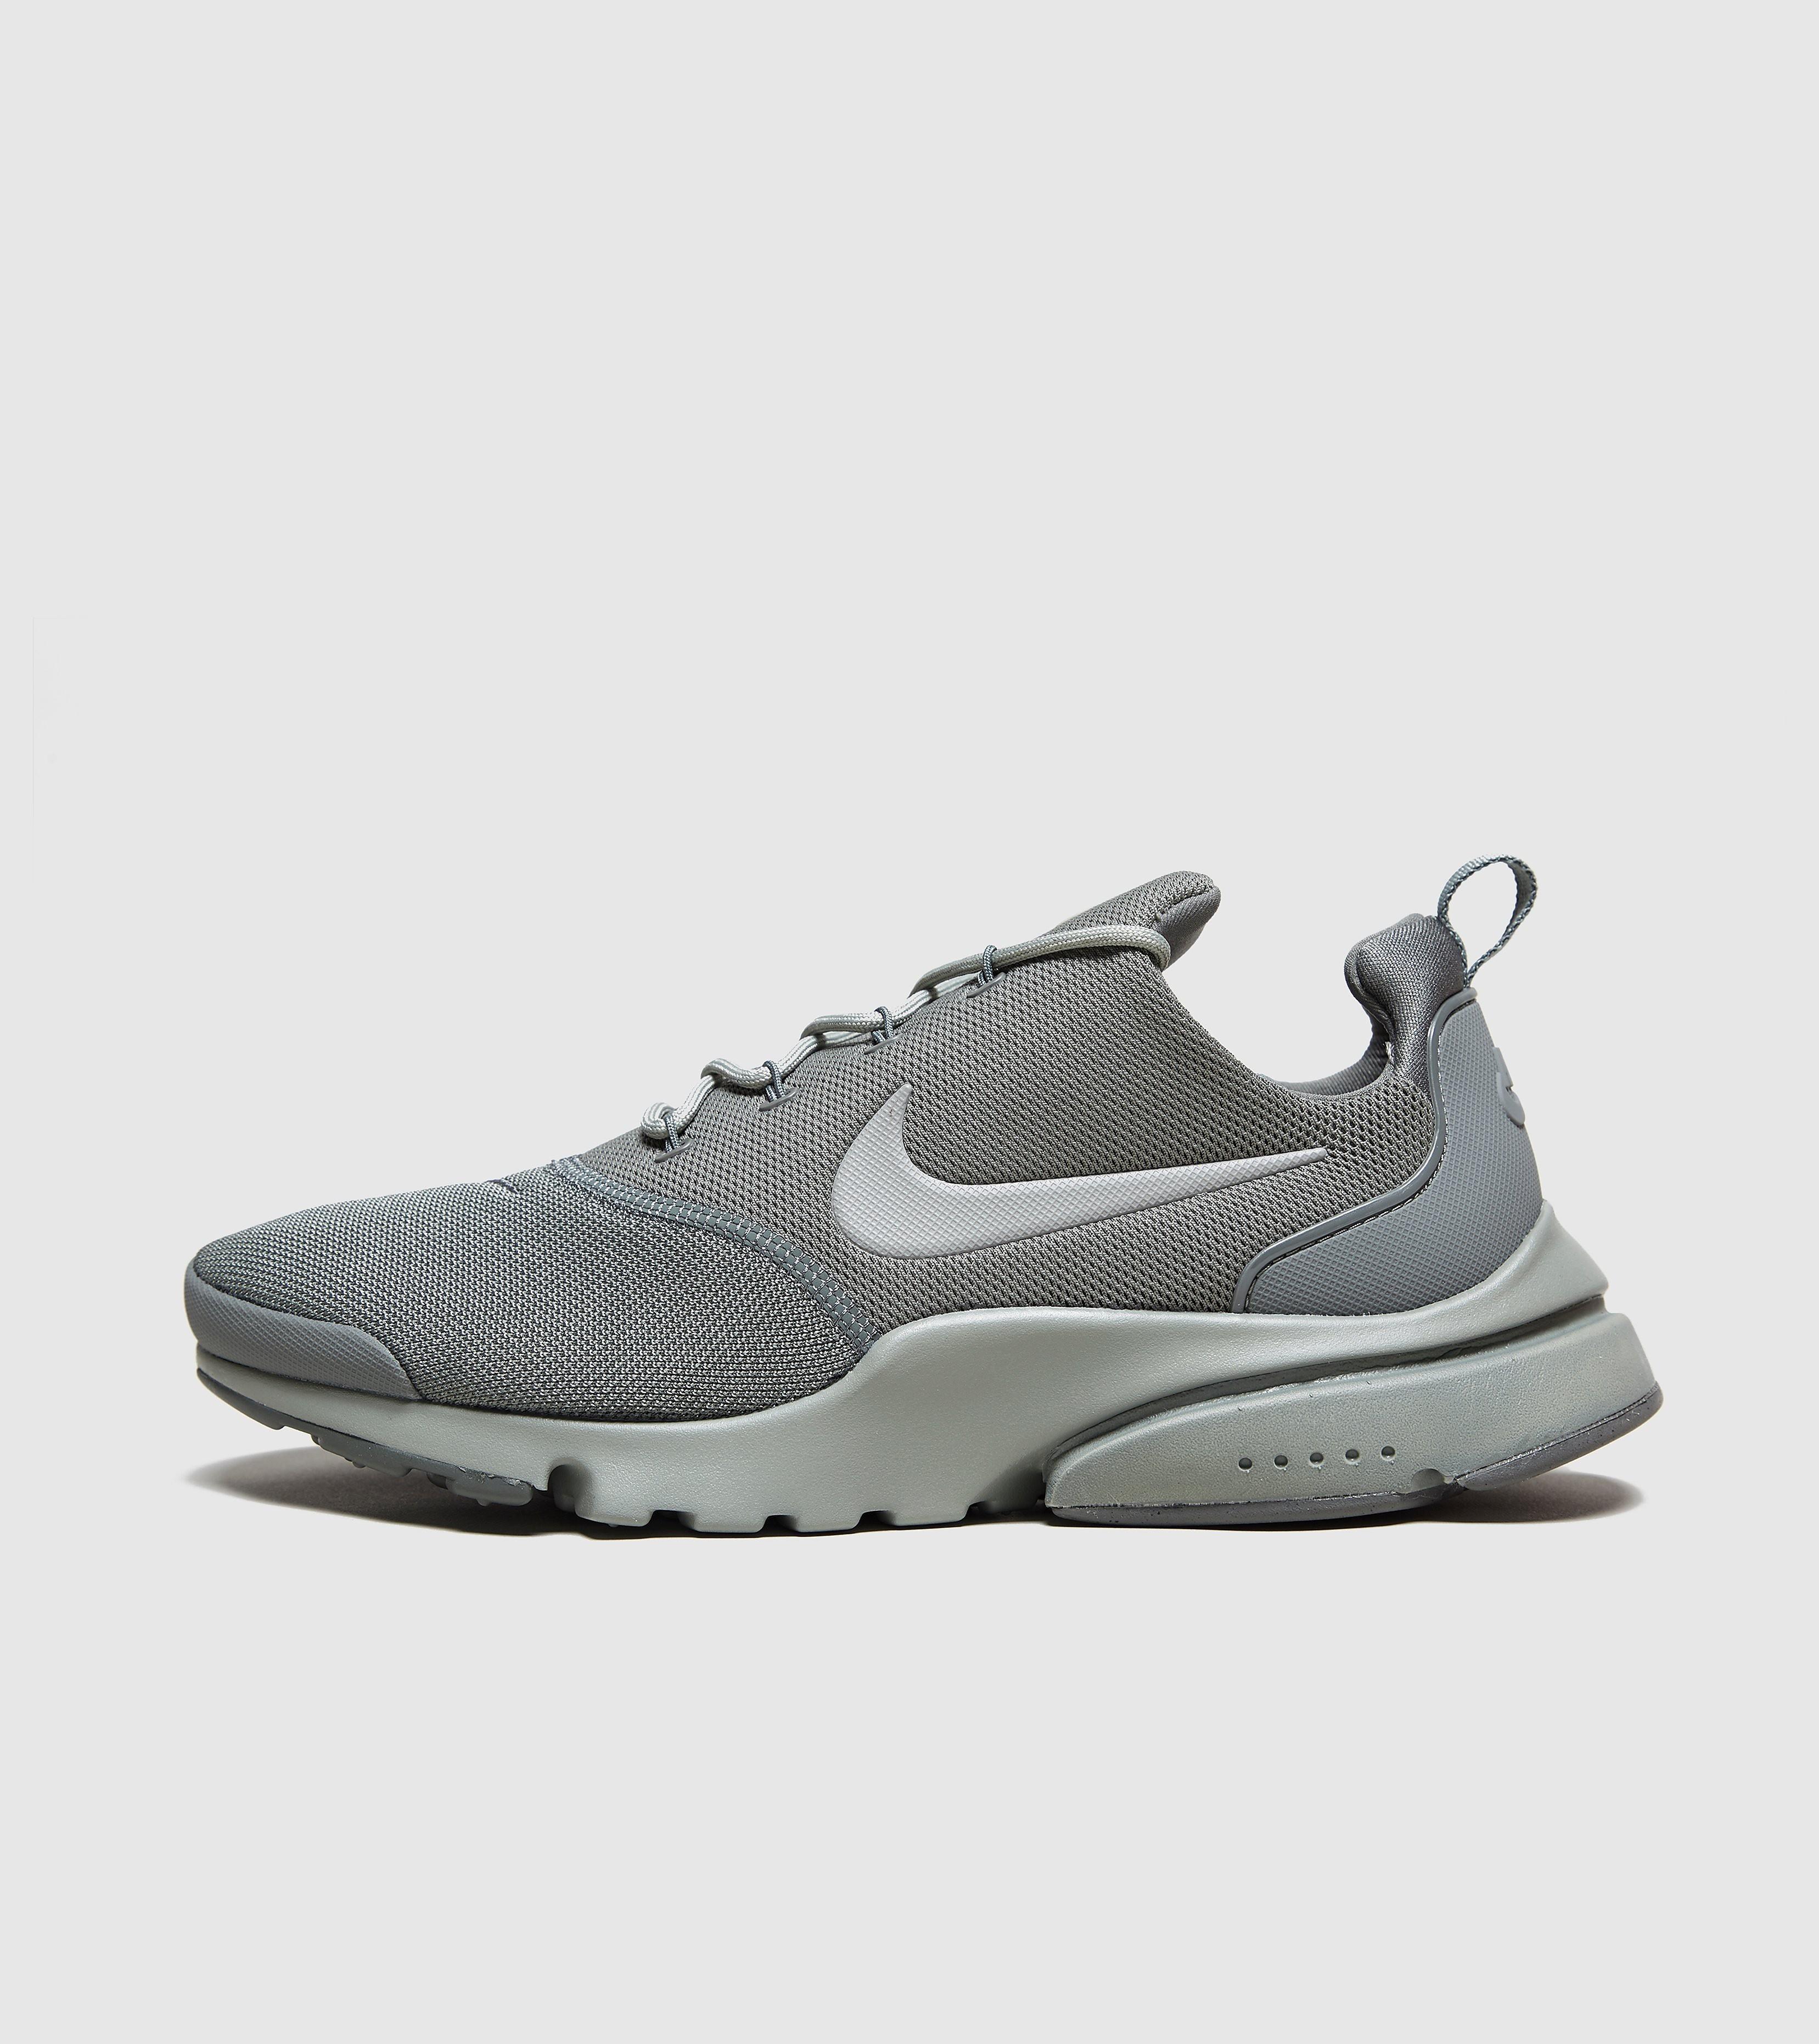 Nike Air Presto Fly